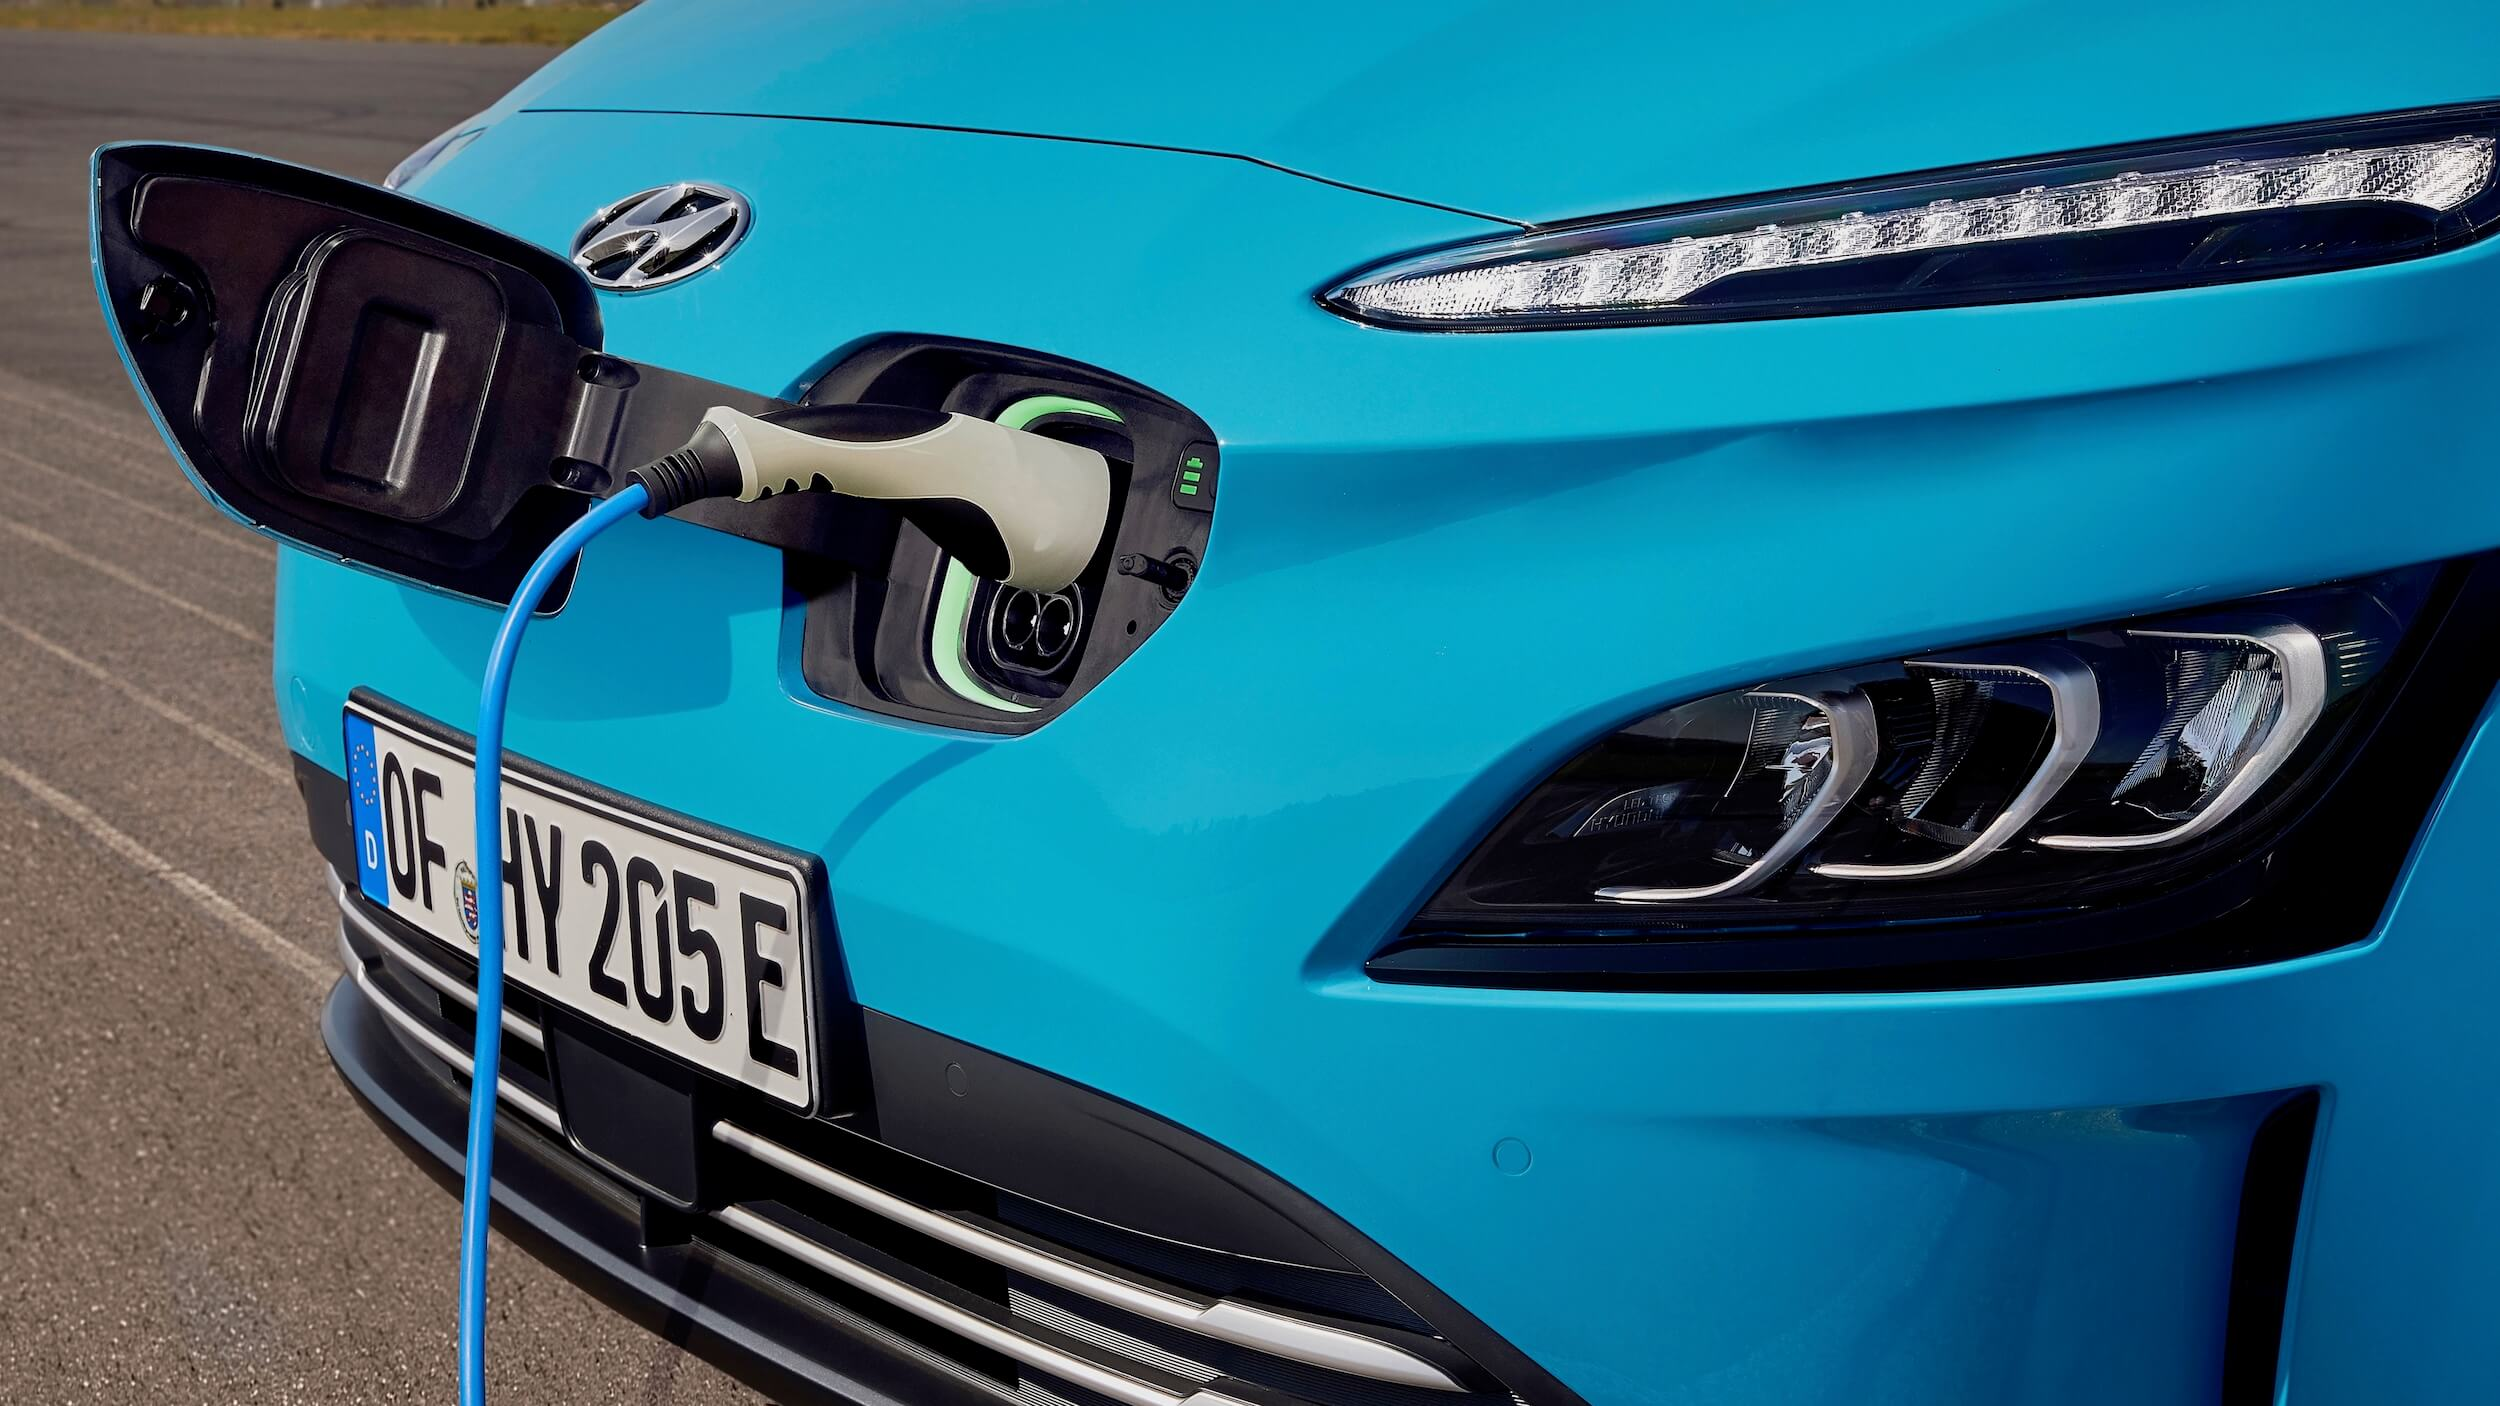 Hyundai Kona Electric carregamento